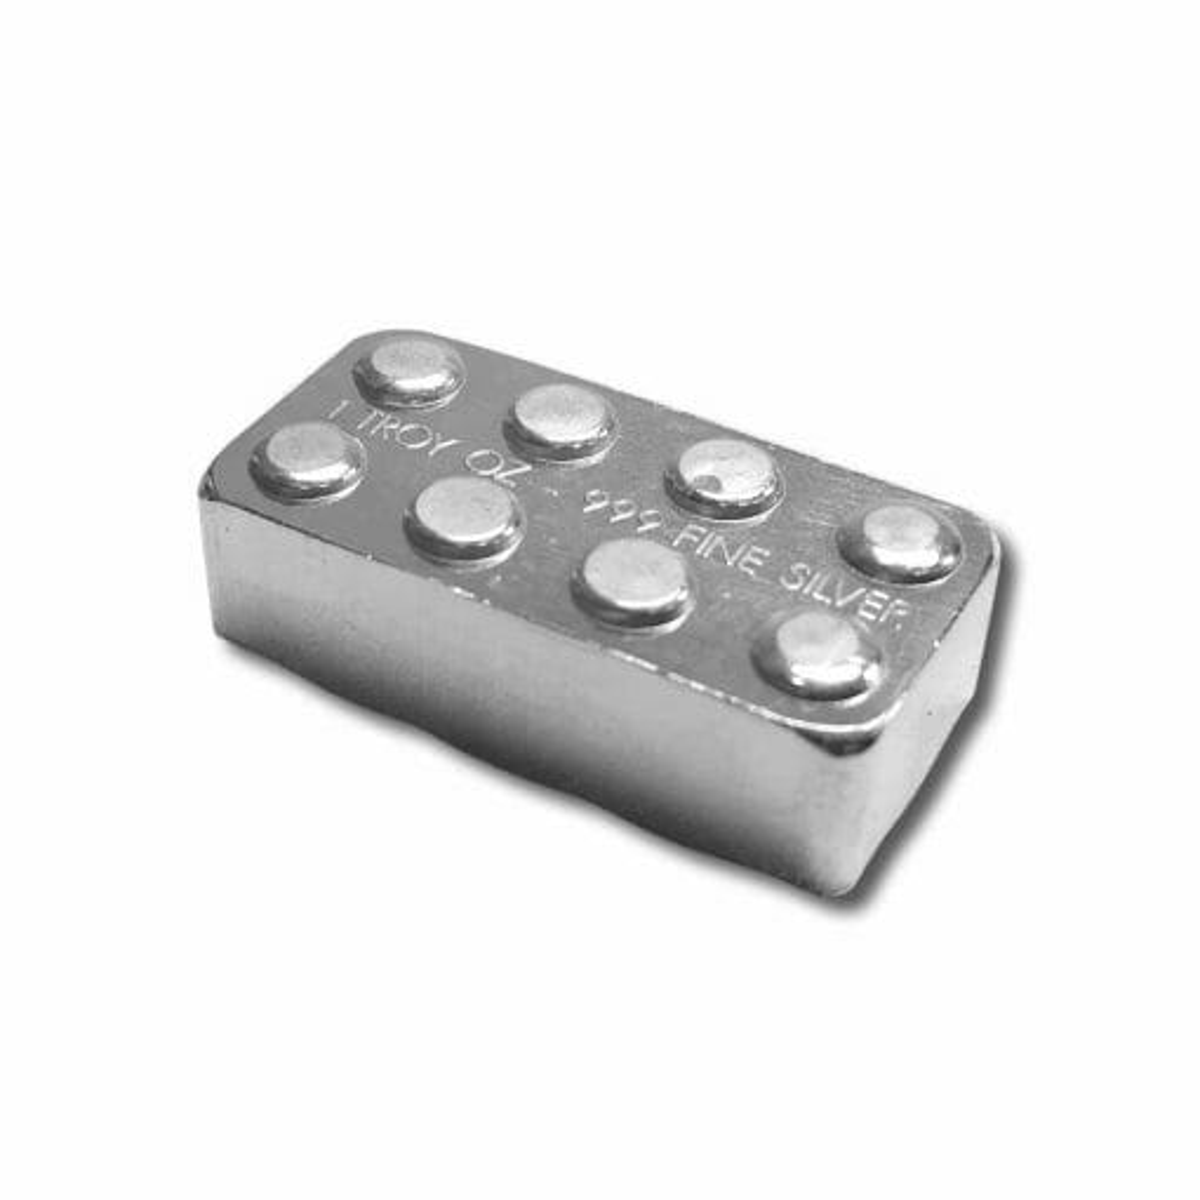 The Starter Kit - 12x 1oz .999 Silver Building Blocks Bars 3